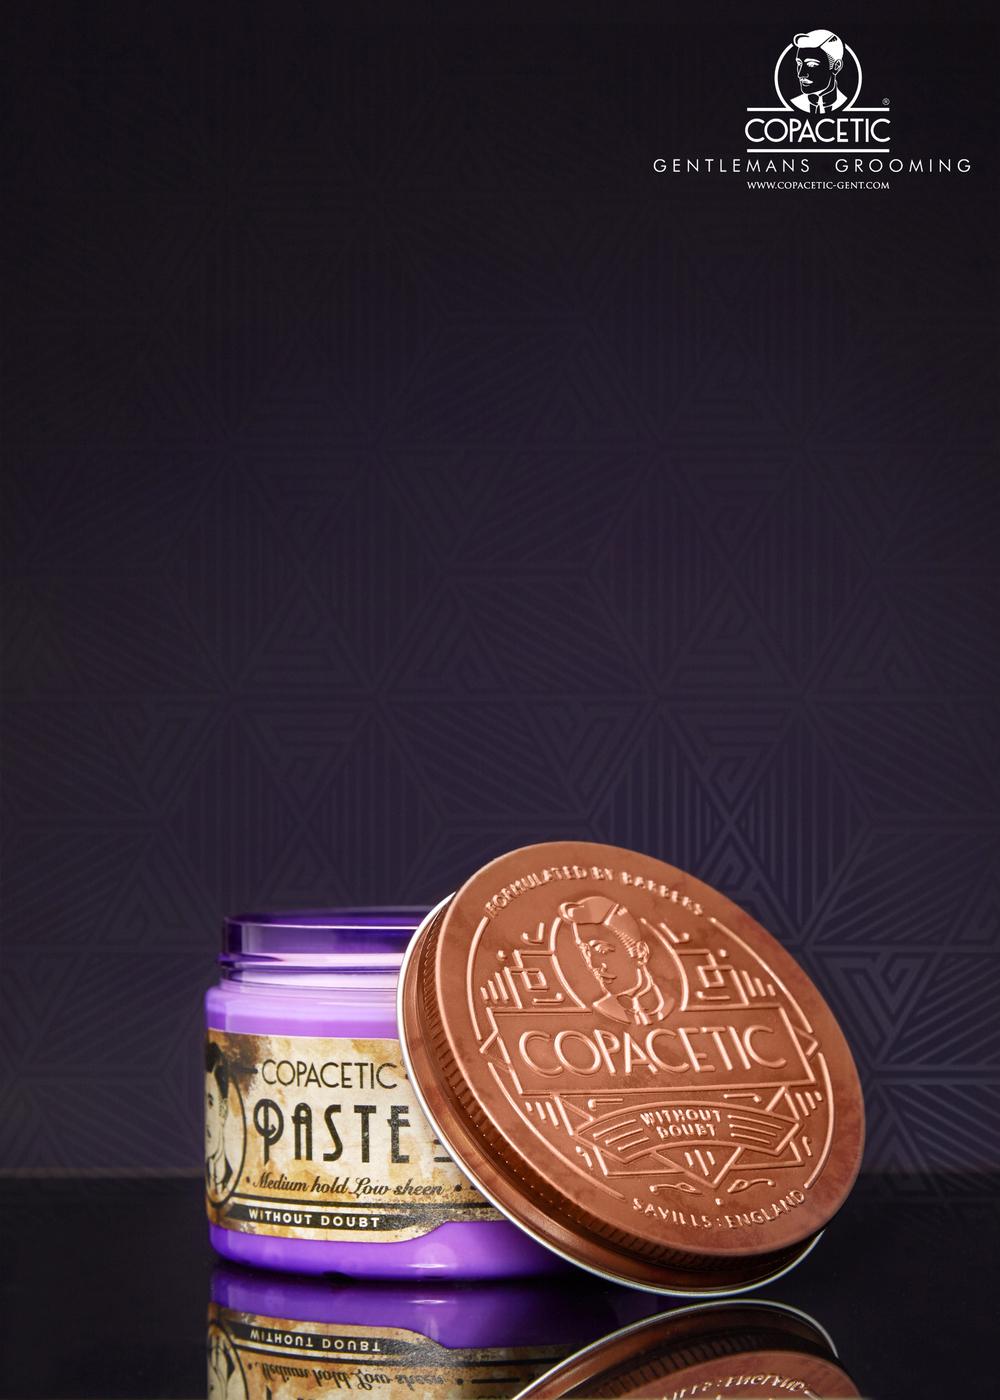 Copacetic-Product-Paste-2.jpg